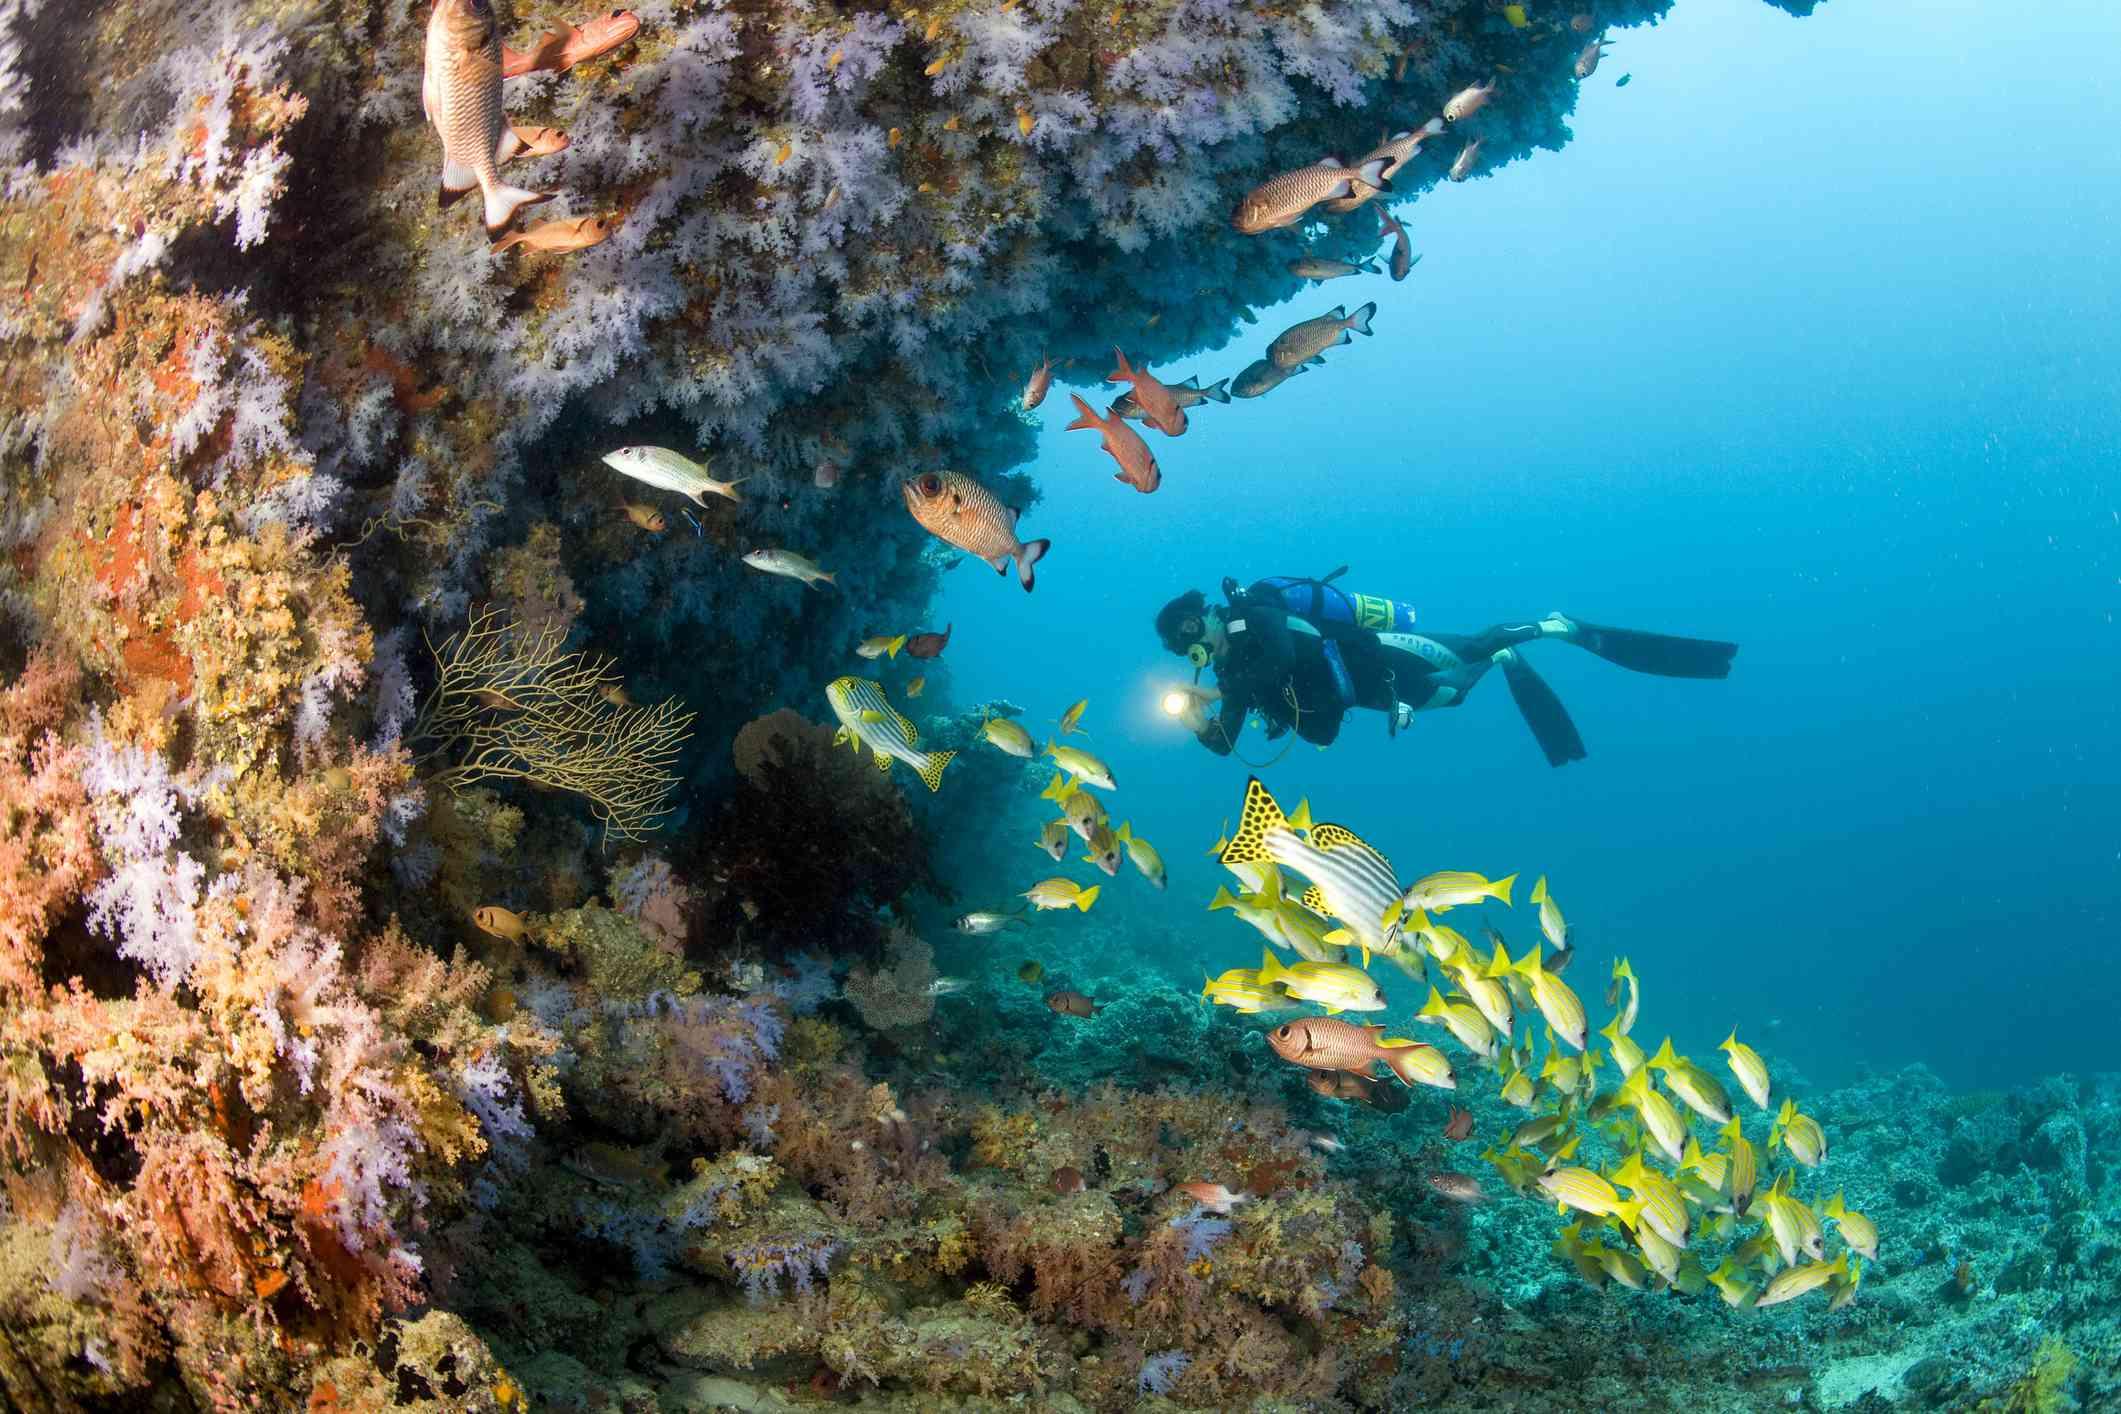 Scuba diving, Ari Atoll, Feridhoo Region, Maldives